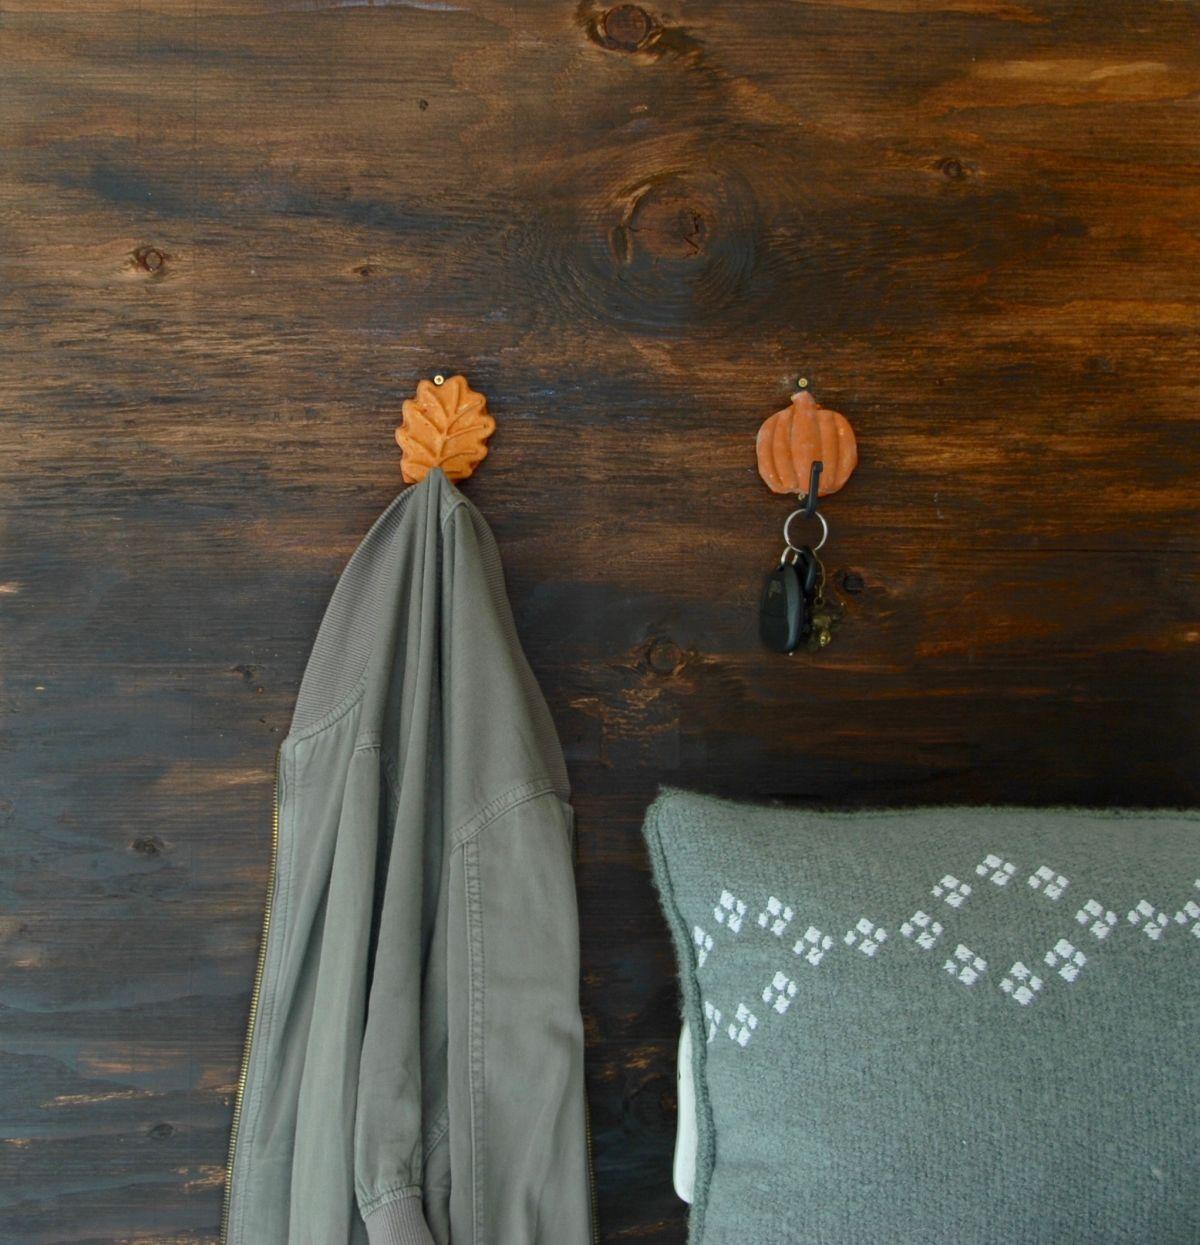 Fall-Inspired Wall Hooks